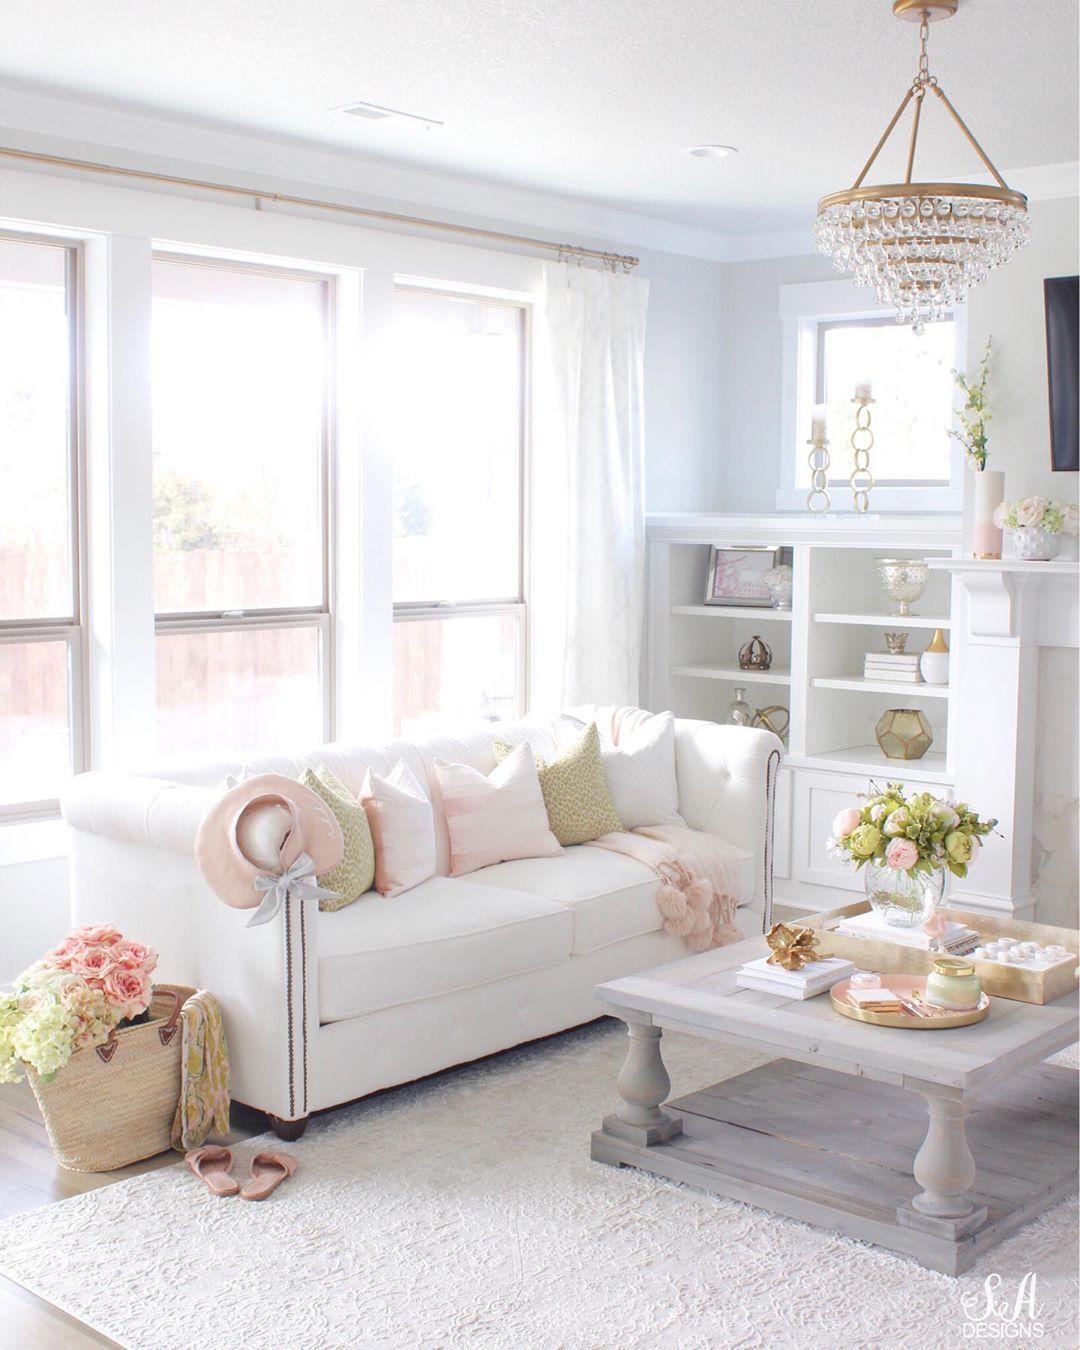 Glam Living Room mit Kristallleuchter via @summeradamsdesigns